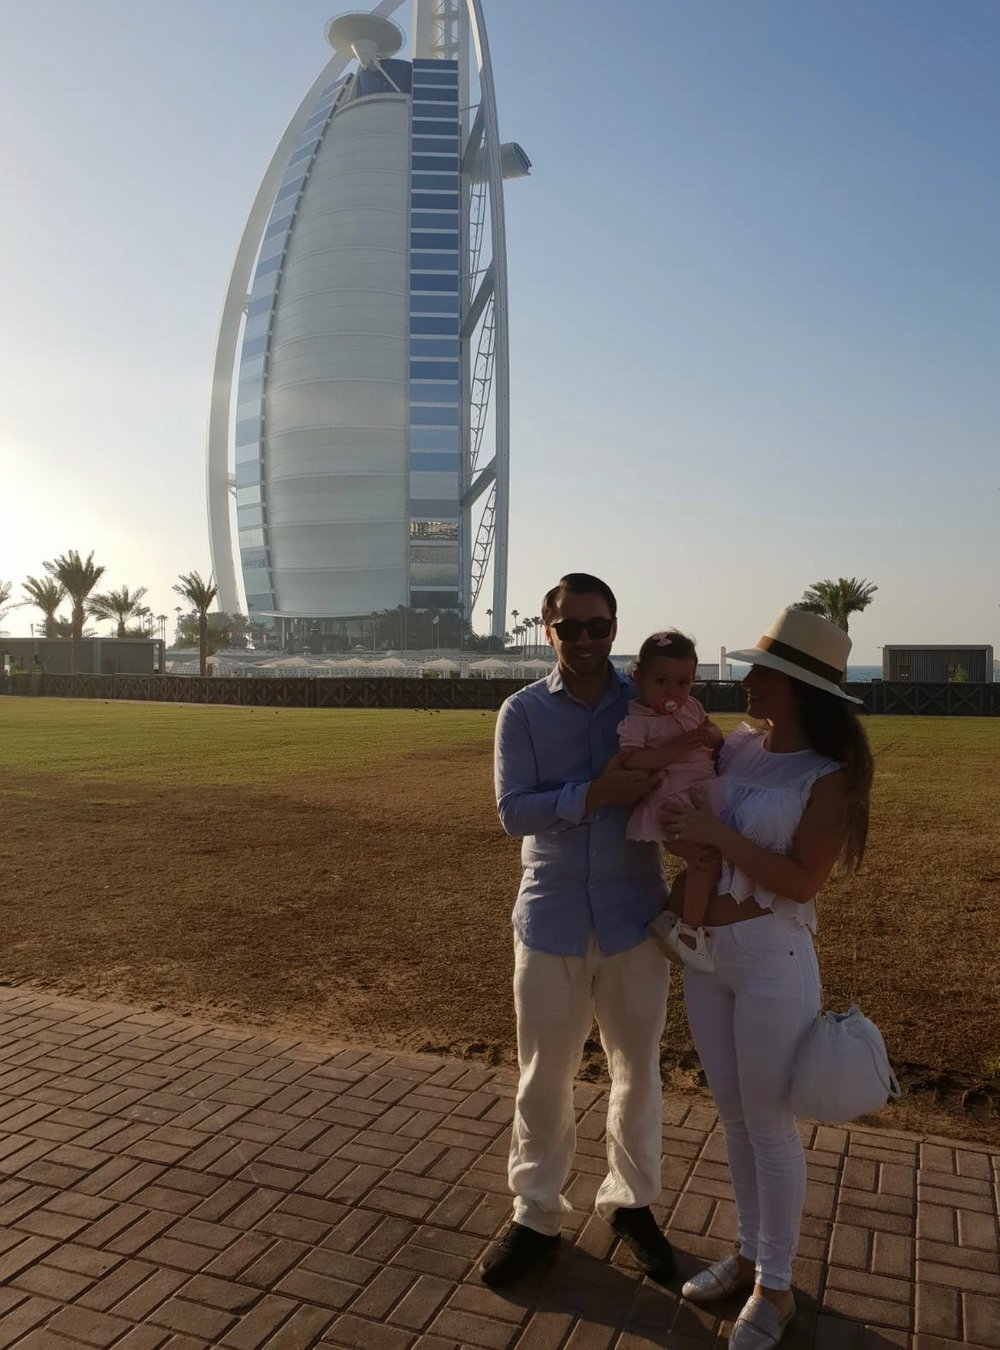 JUMEIRAH BEACH HOTEL • DUBAI, UAE PHOTOGRAPHER: SUZANA